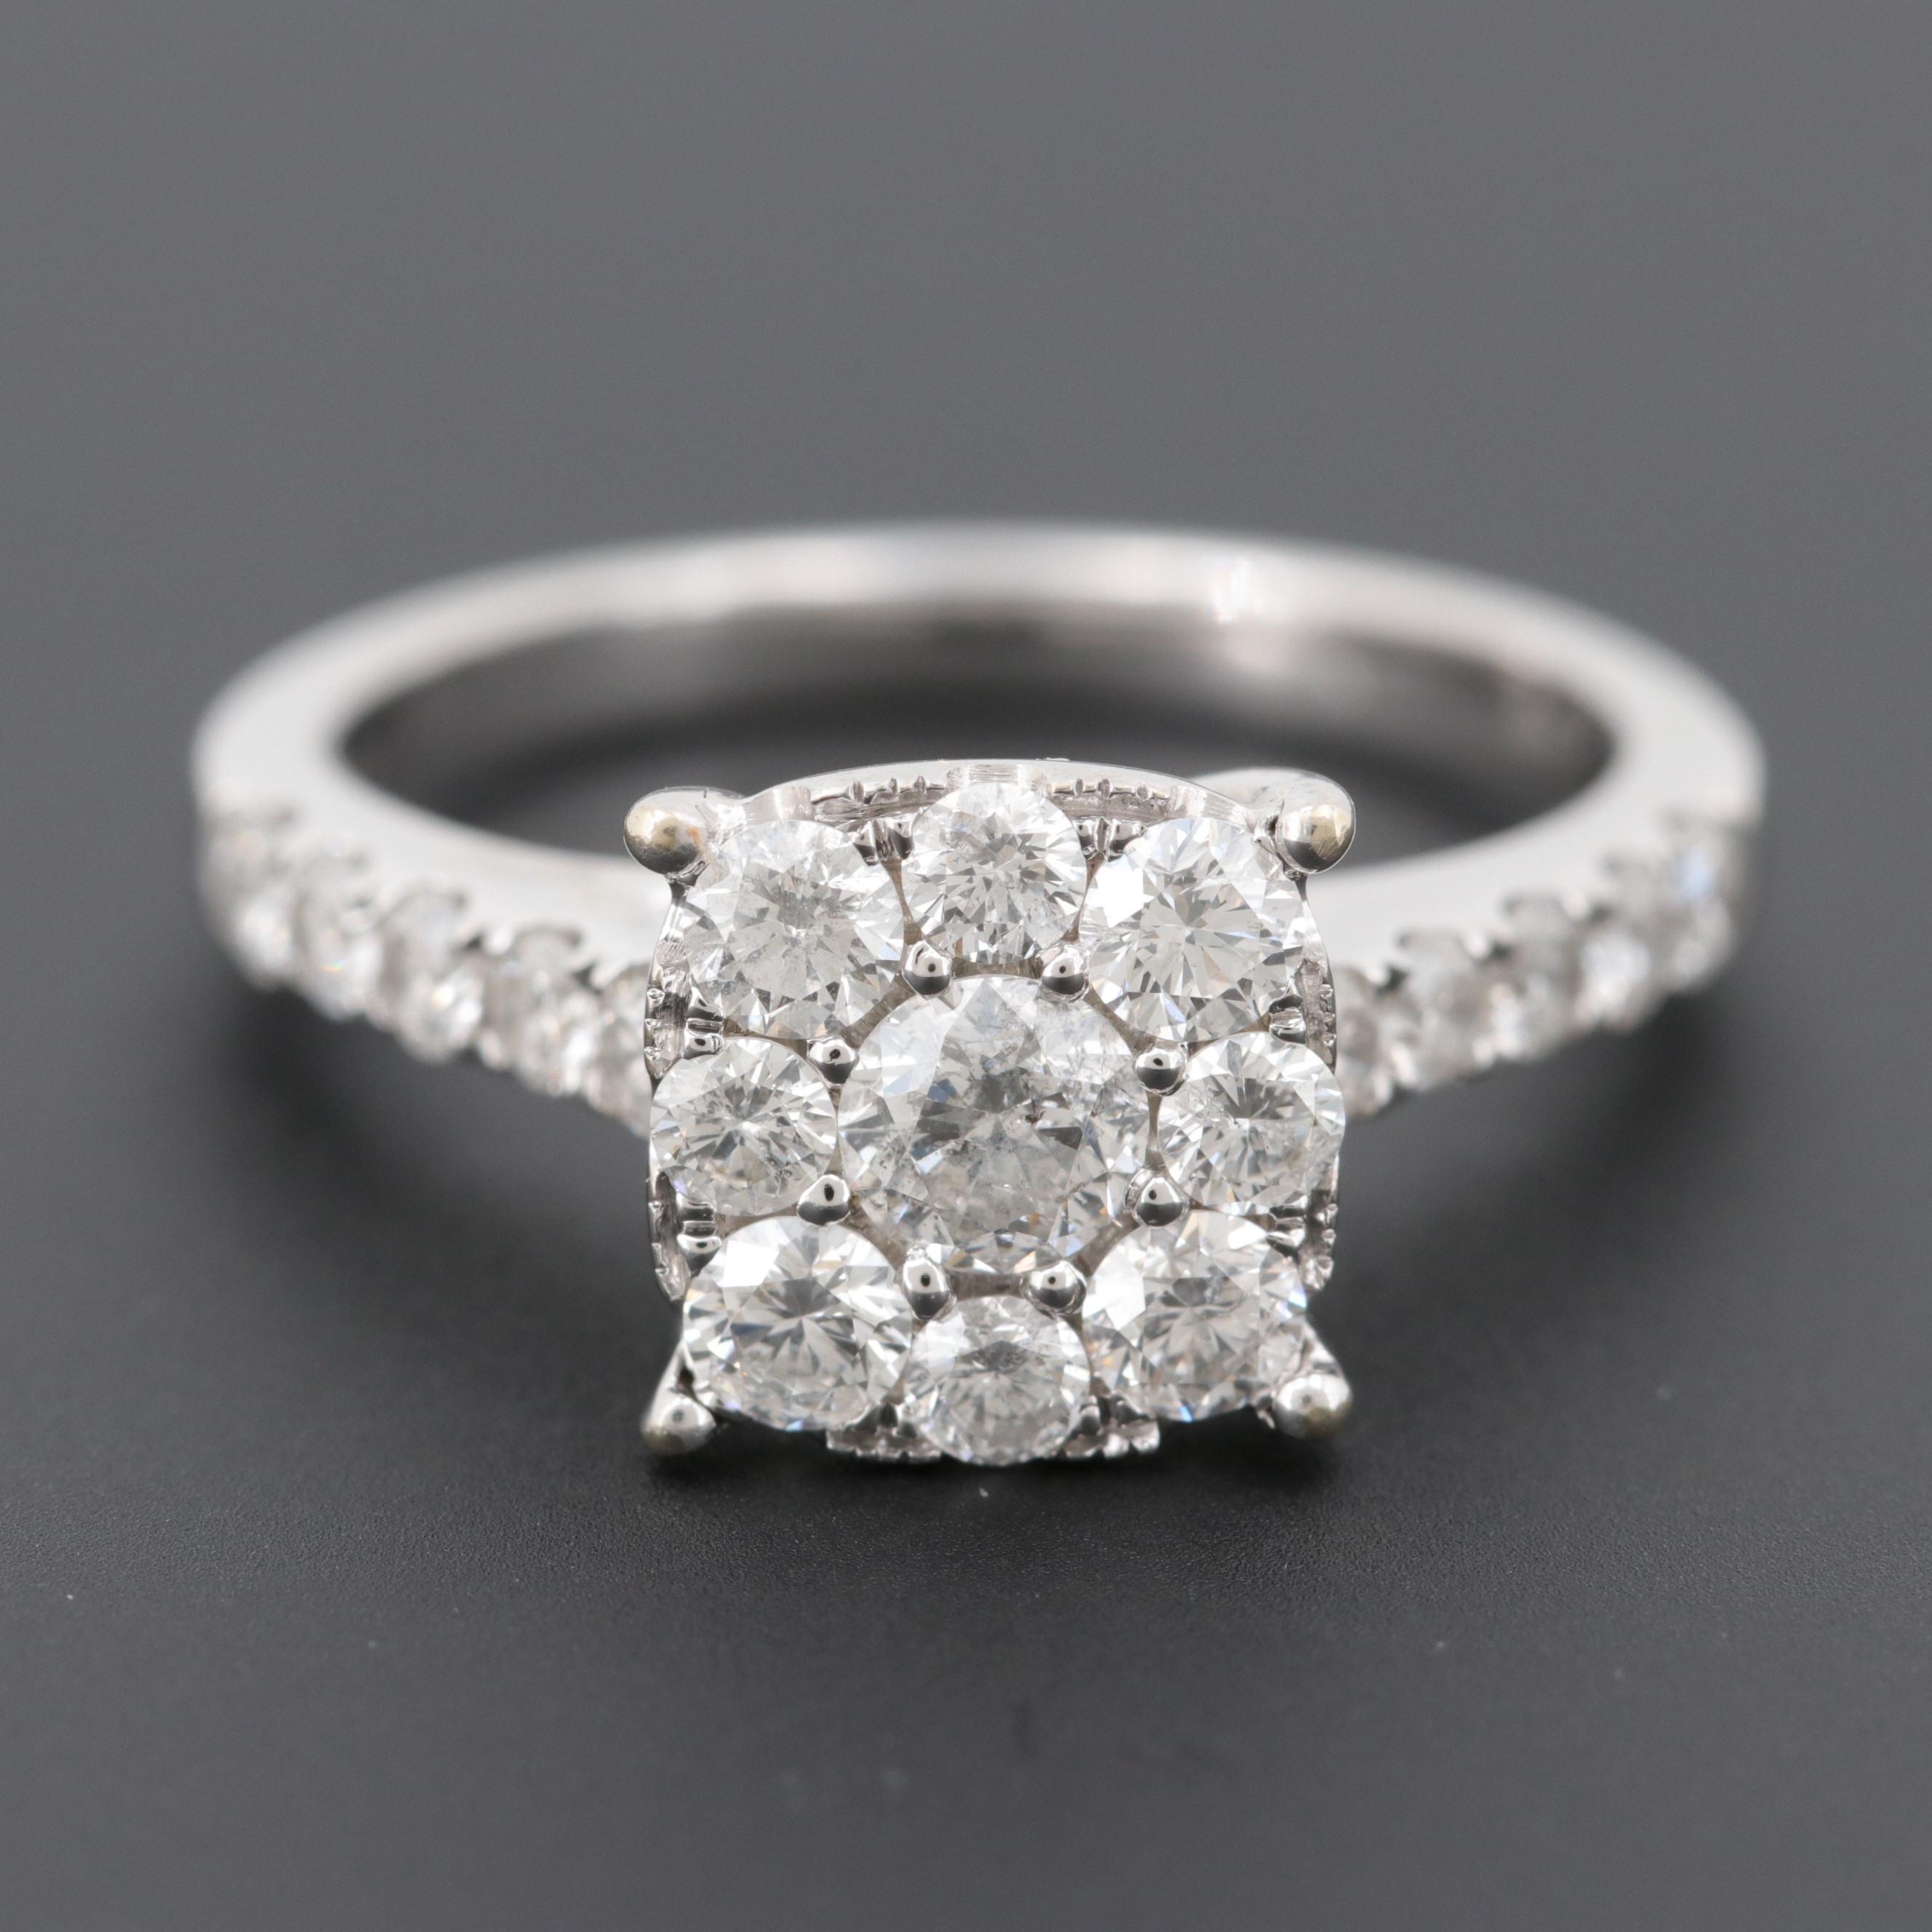 14K White Gold 1.10 CTW Diamond Ring